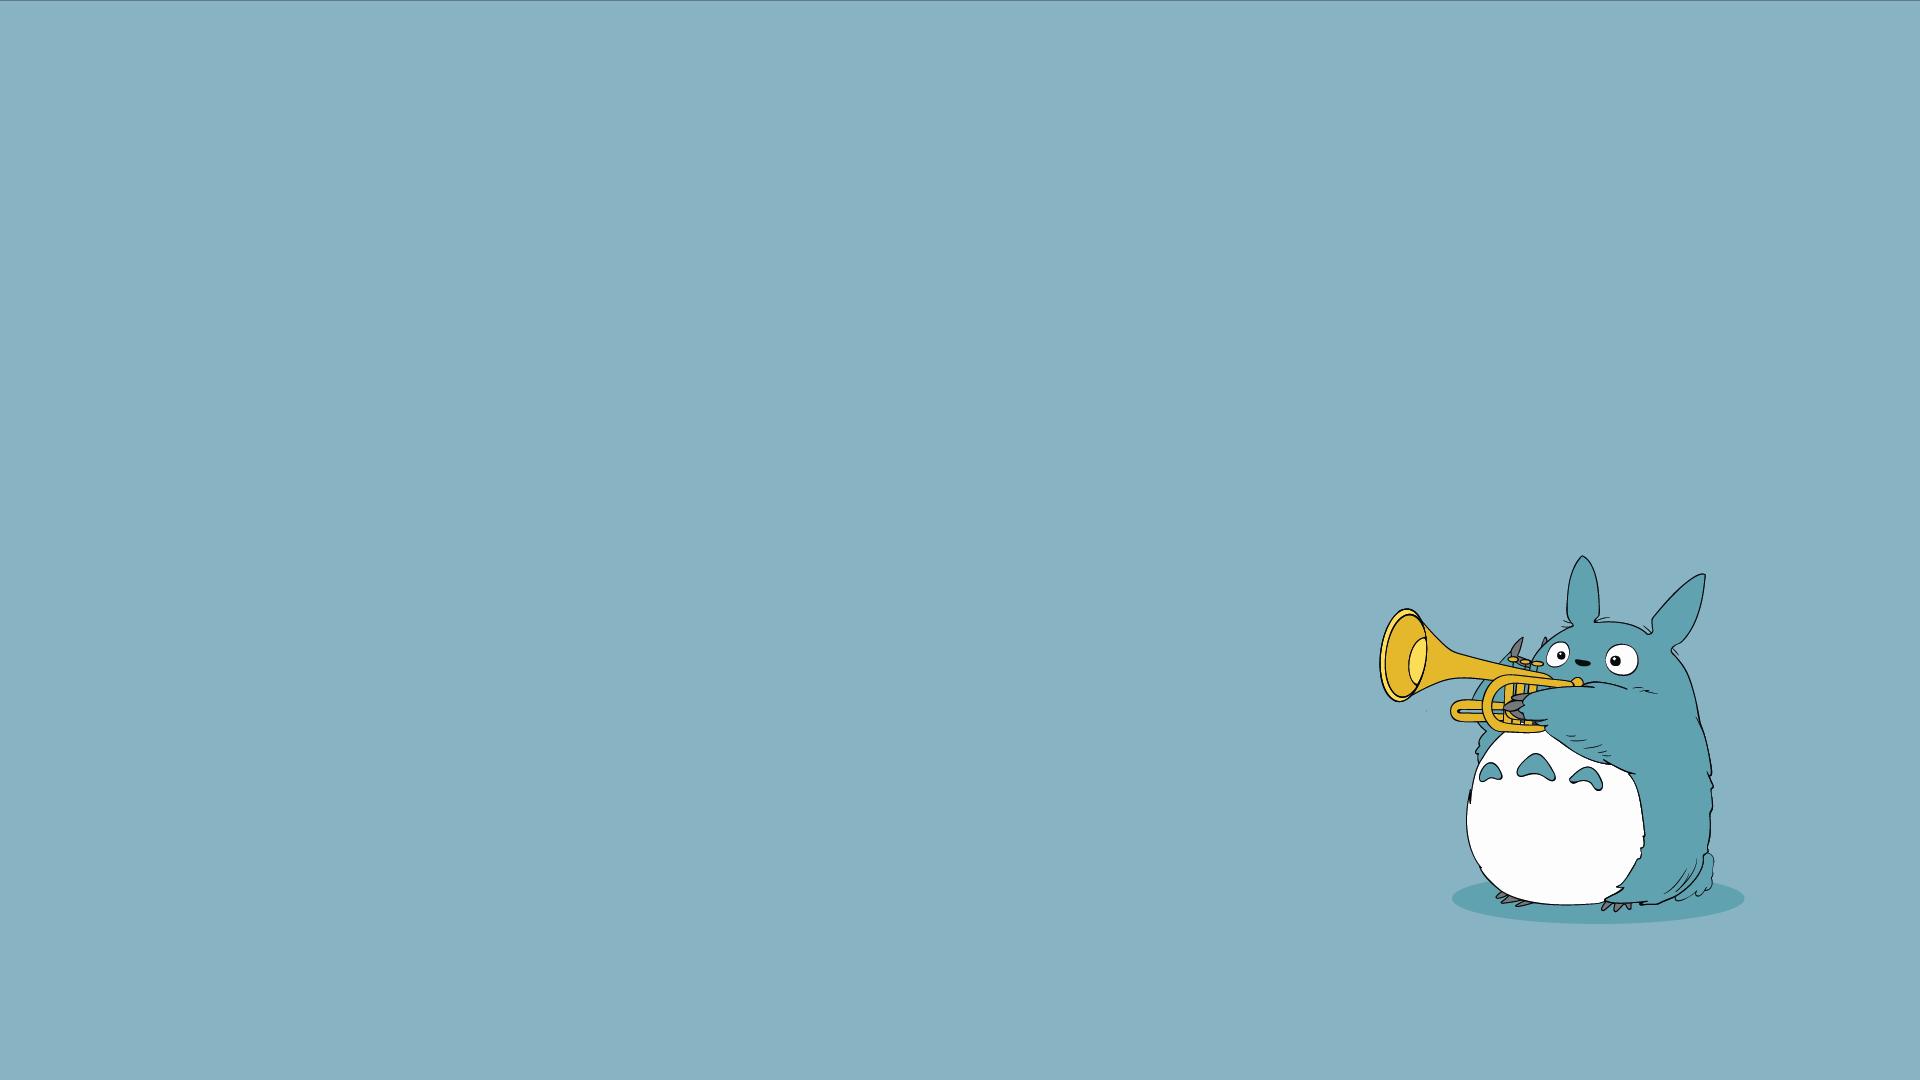 Minimal Totoro Wallpaper Studio Ghibli Wallpaper For Desktop Cute Desktop Wallpaper Cute Cartoon Wallpapers Cartoon Wallpaper